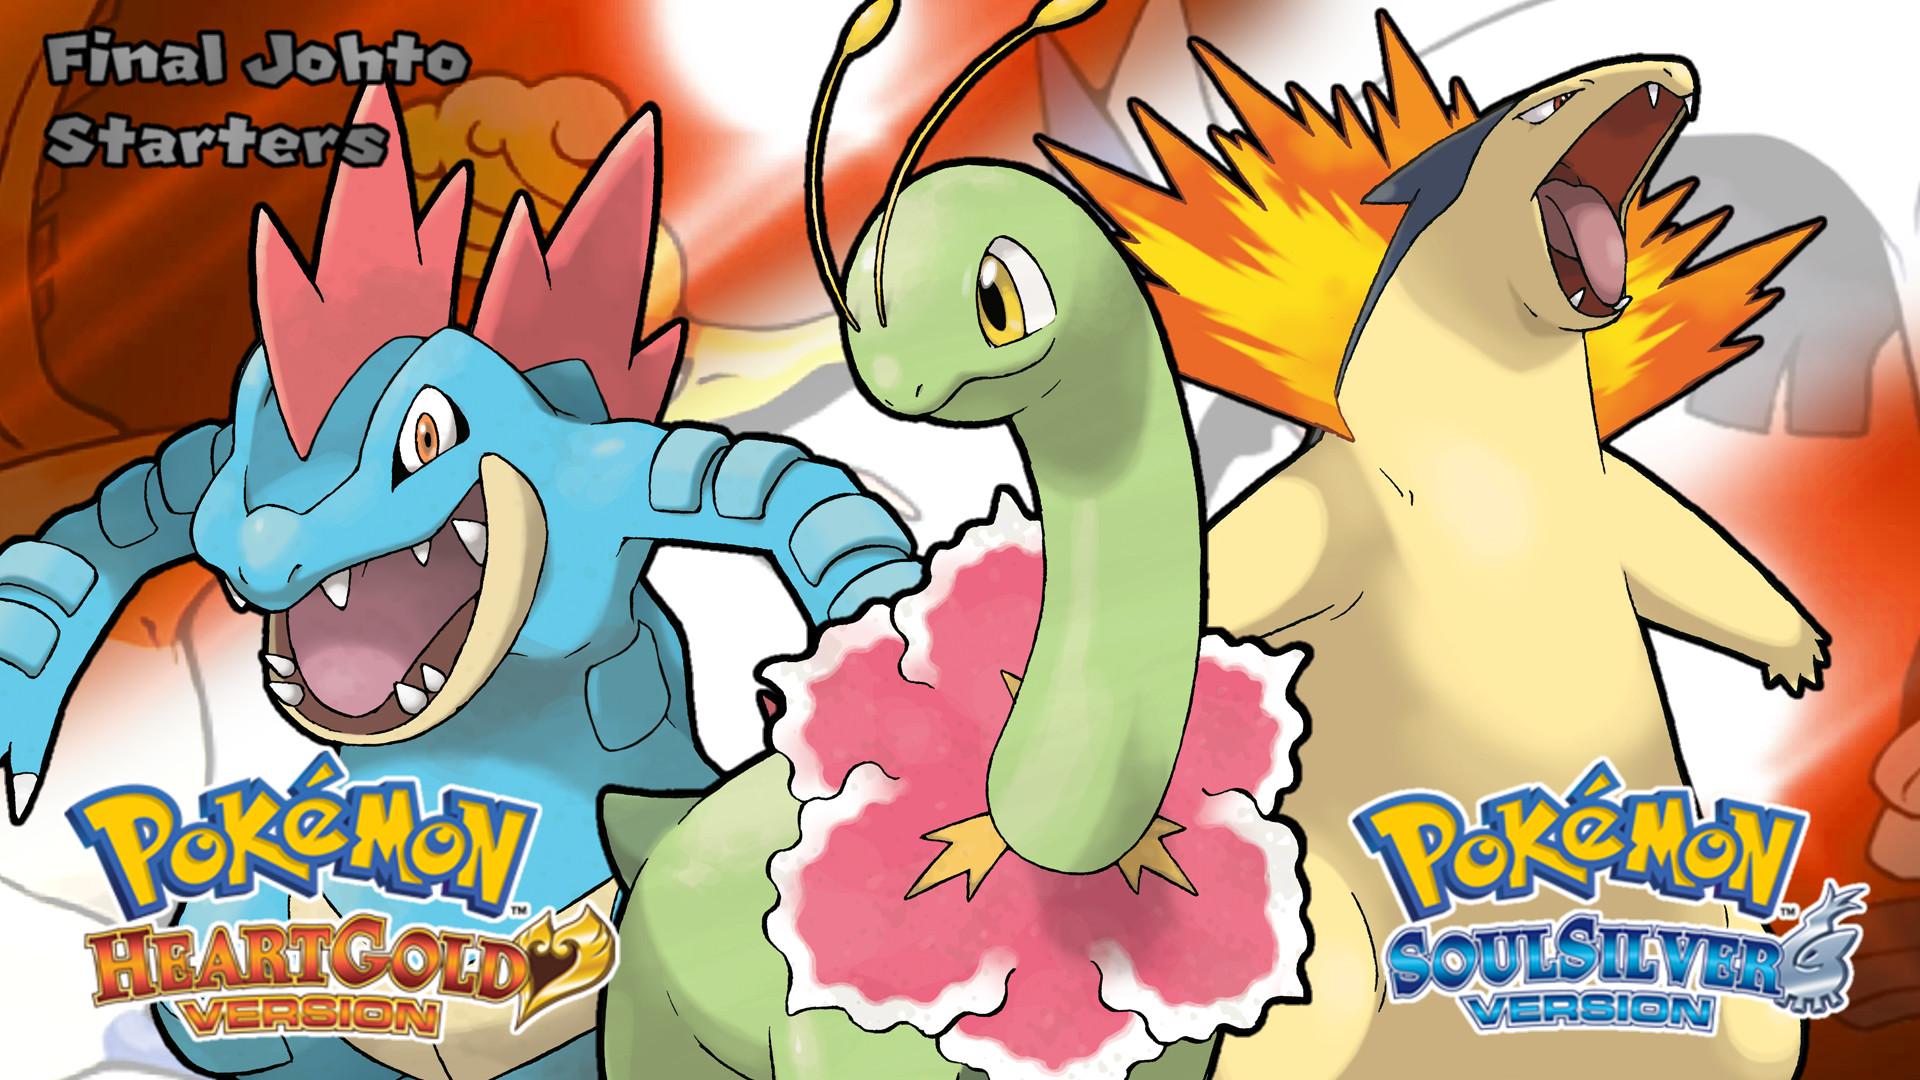 … Pokemon HGSS- Final Johto Starters Wallpaper by MattPlaysVG